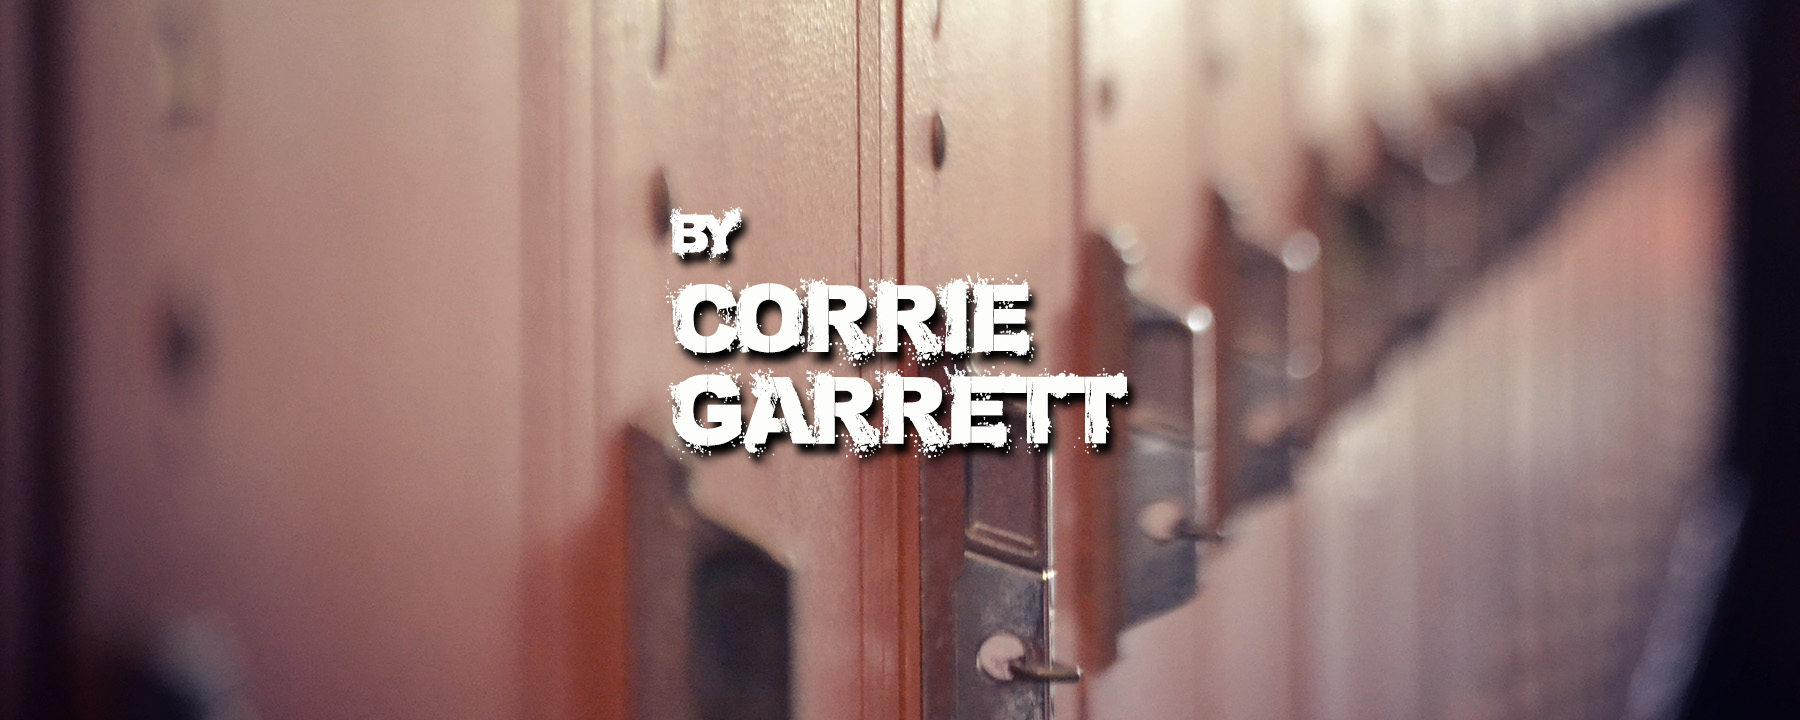 corrie-garrett_empty-lockers